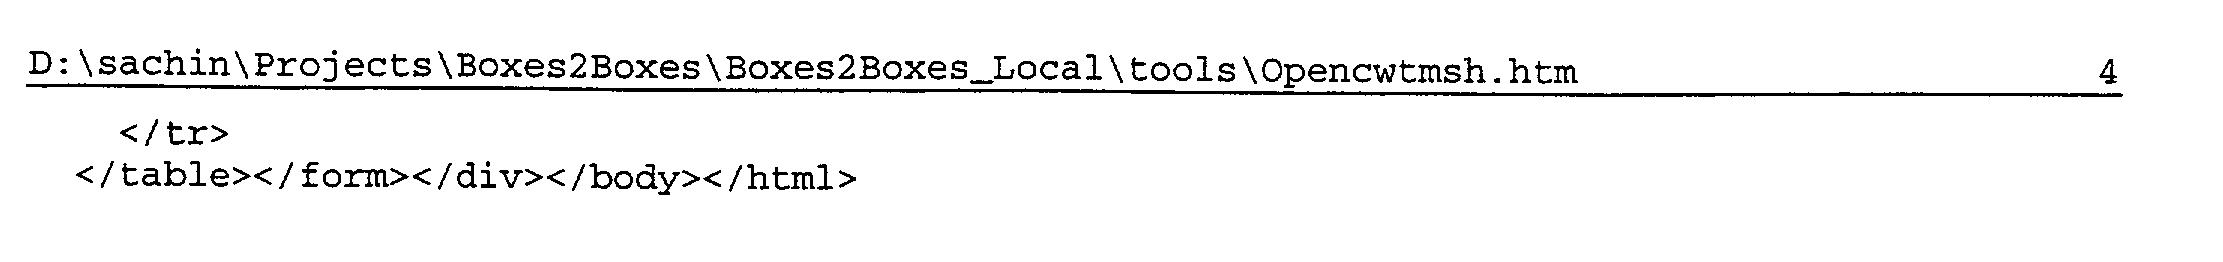 Figure US20020035507A1-20020321-P00457